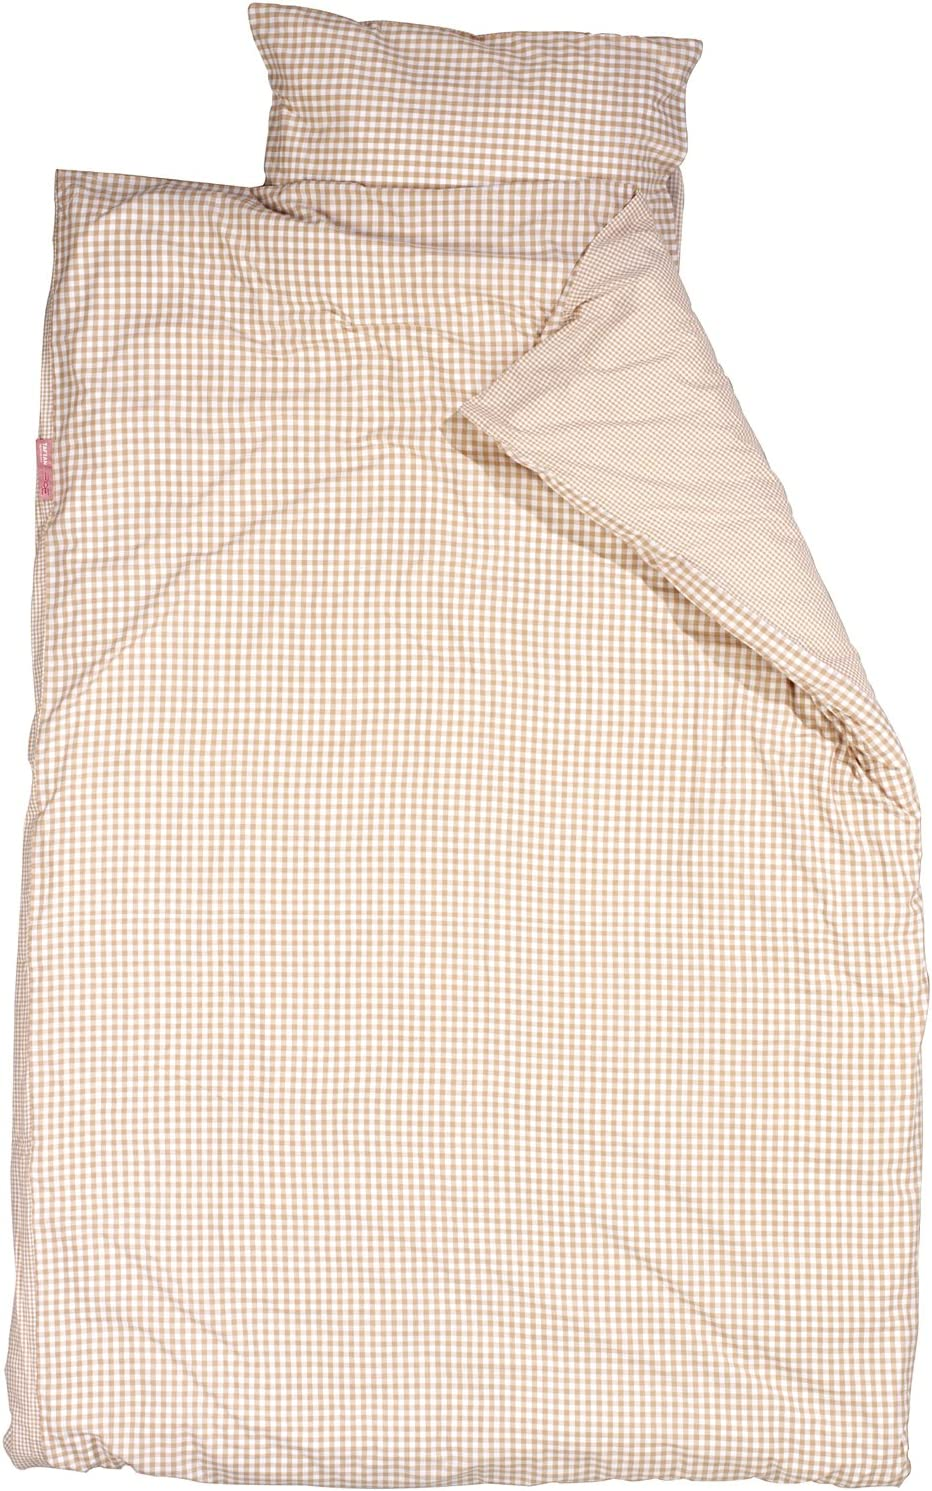 Beige Taftan Checks Small// Big Duvet Cover Set 100 x 135cm for Cot